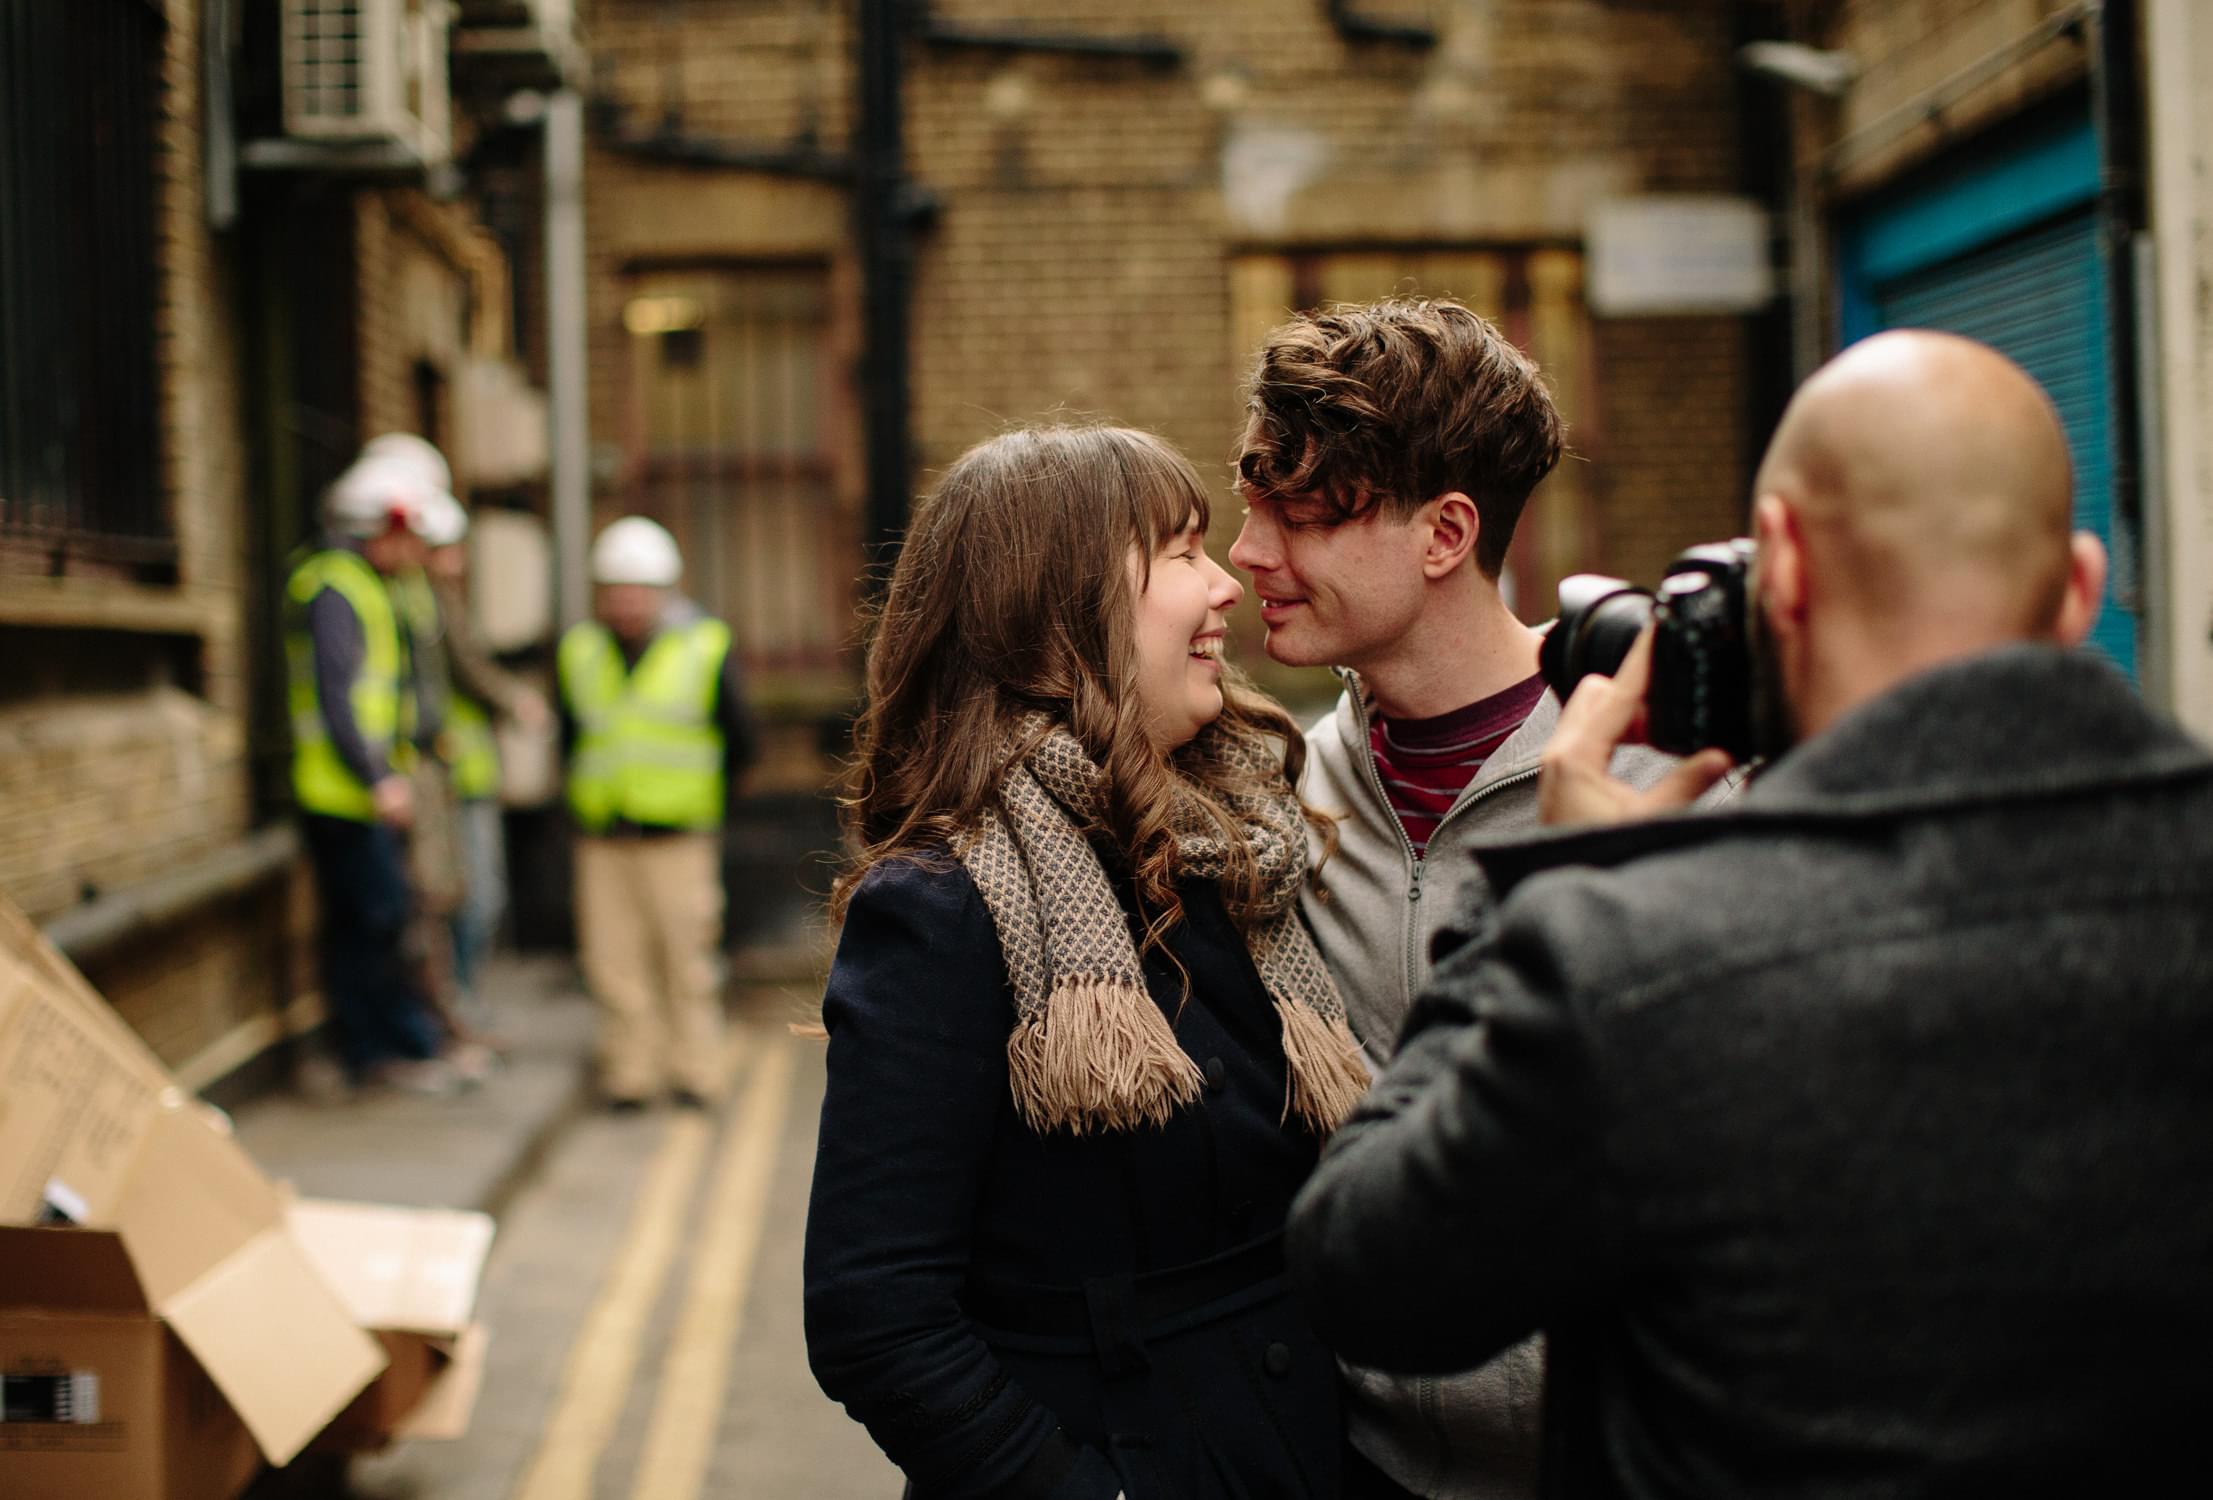 share-the-journey-london-wedding-photography-workshop-28